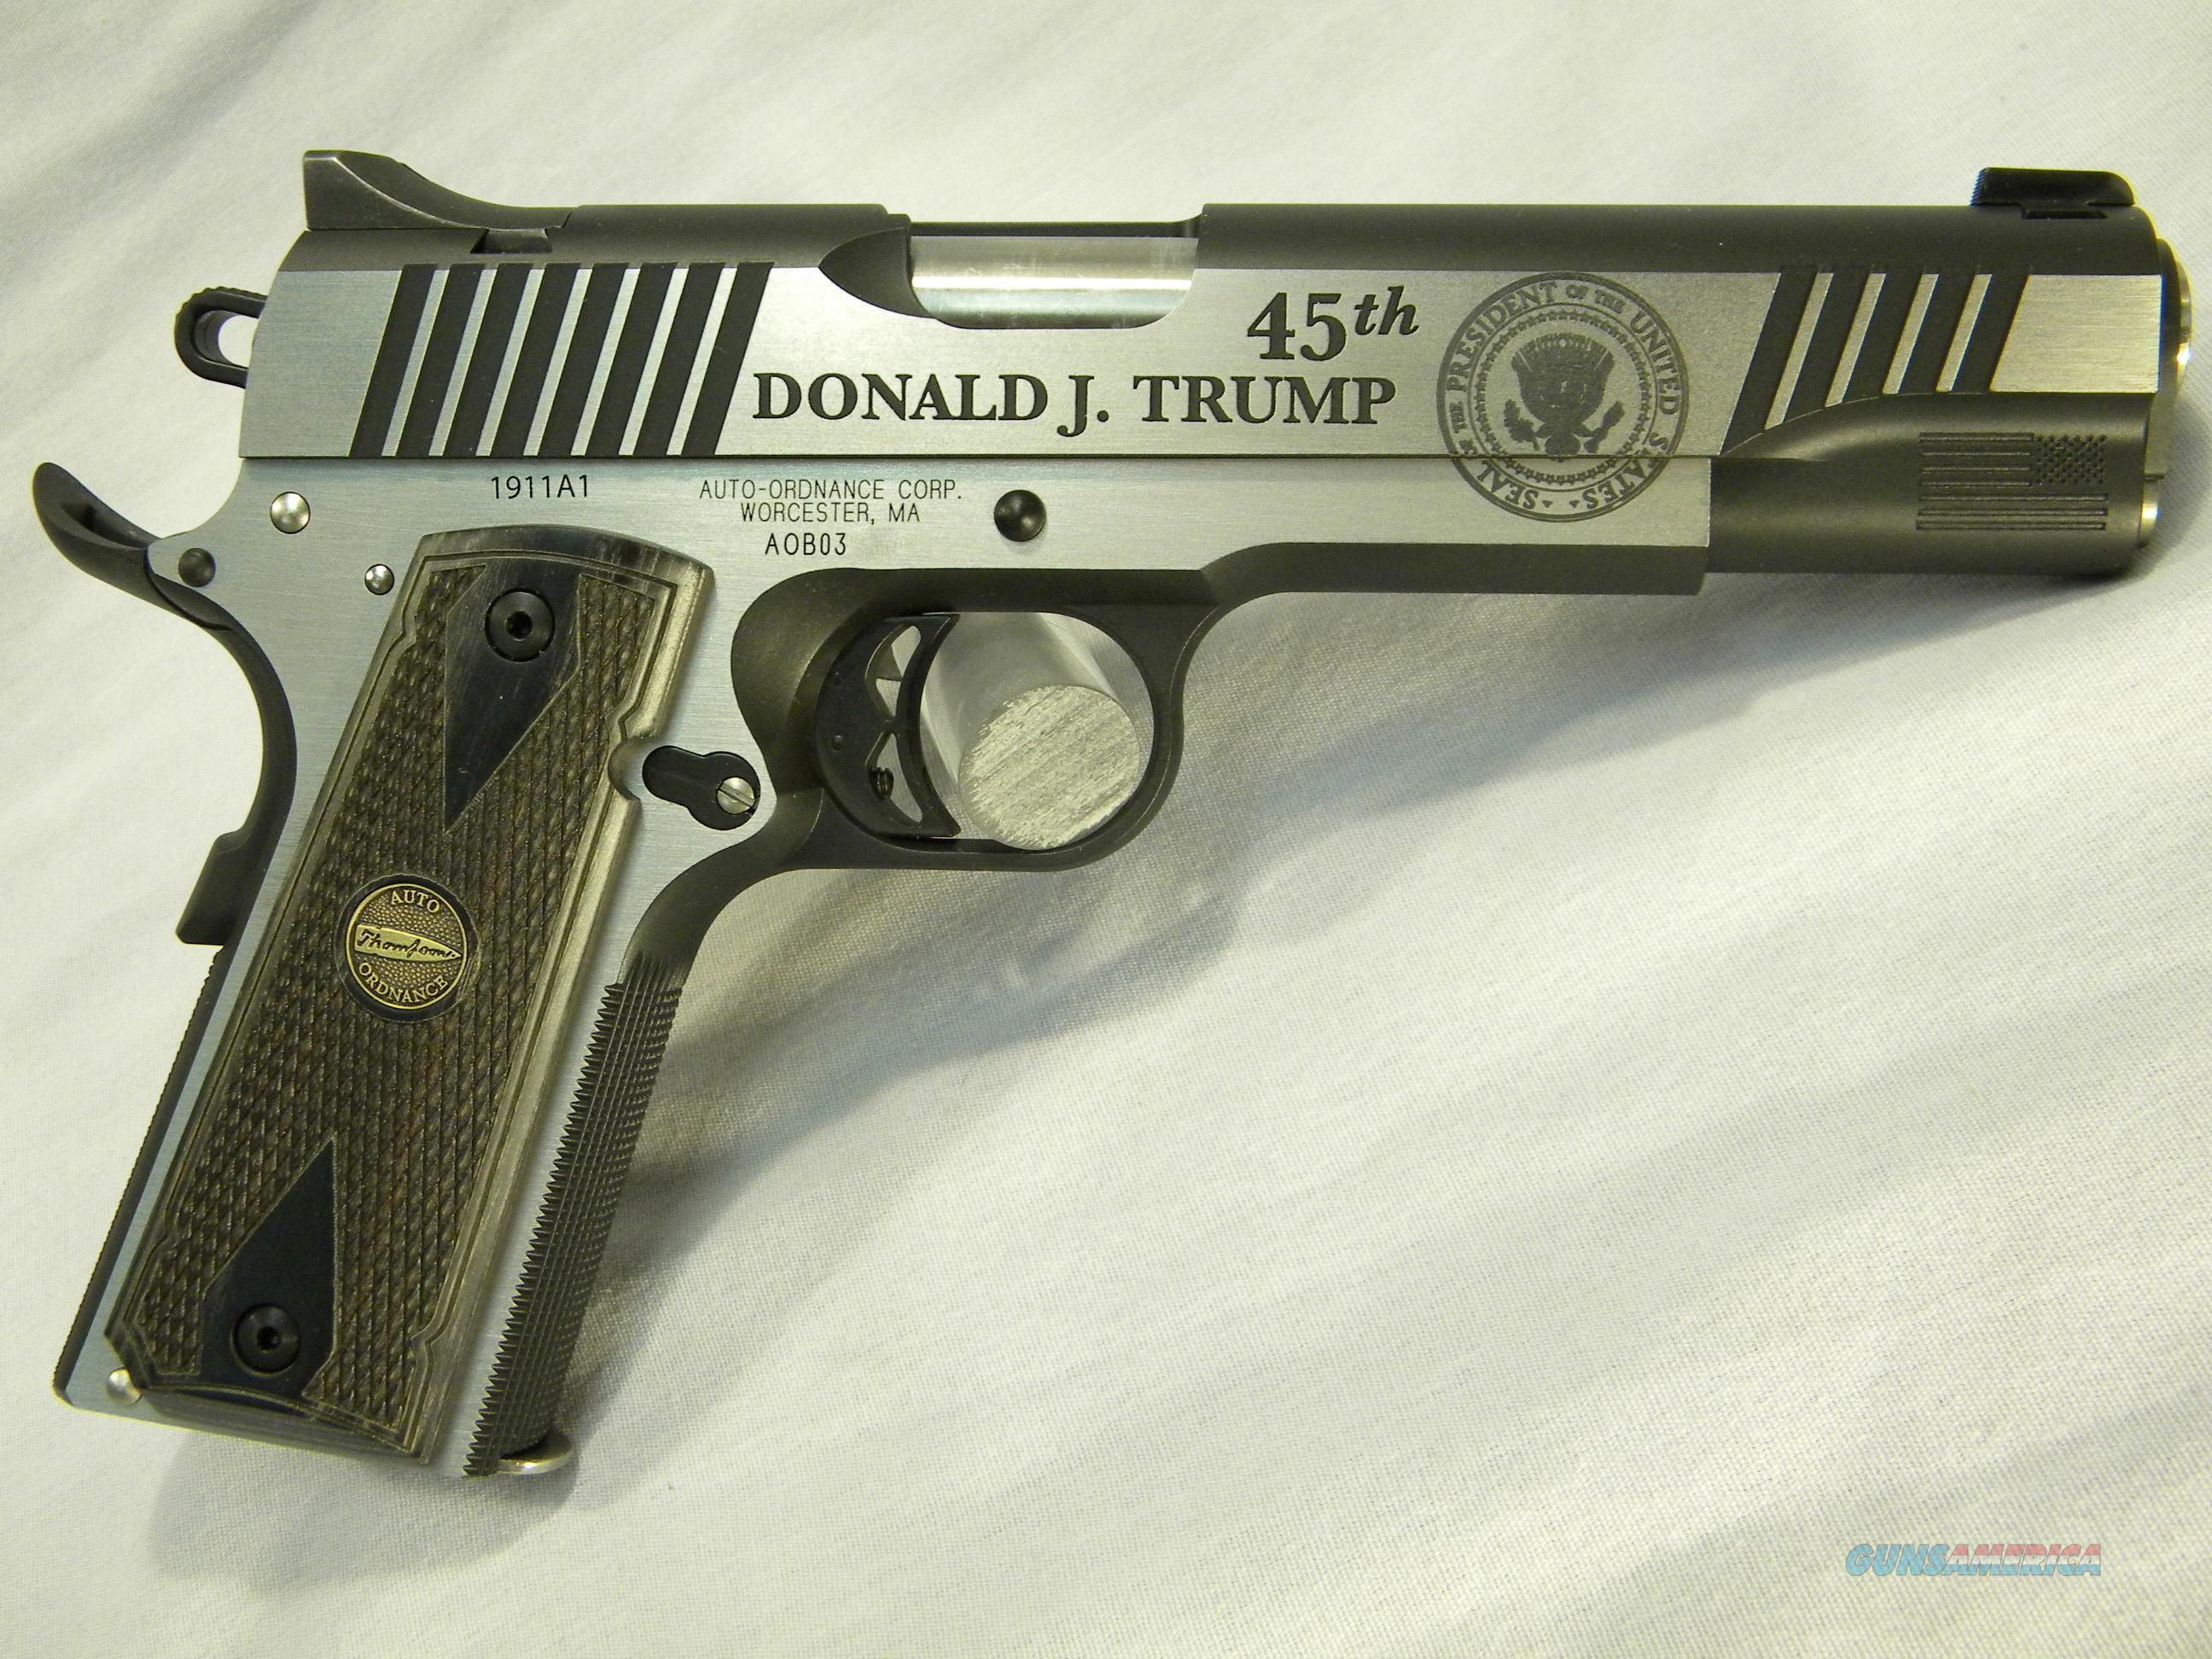 "1911 ""Trump Commemorative"", ""Trump 45"", .45 ACP 1911-A1 Semi-Auto Pistol, One Of Only 2,500 Made By Thompson/Auto Ordnance  Guns > Pistols > Auto Ordnance Pistols"